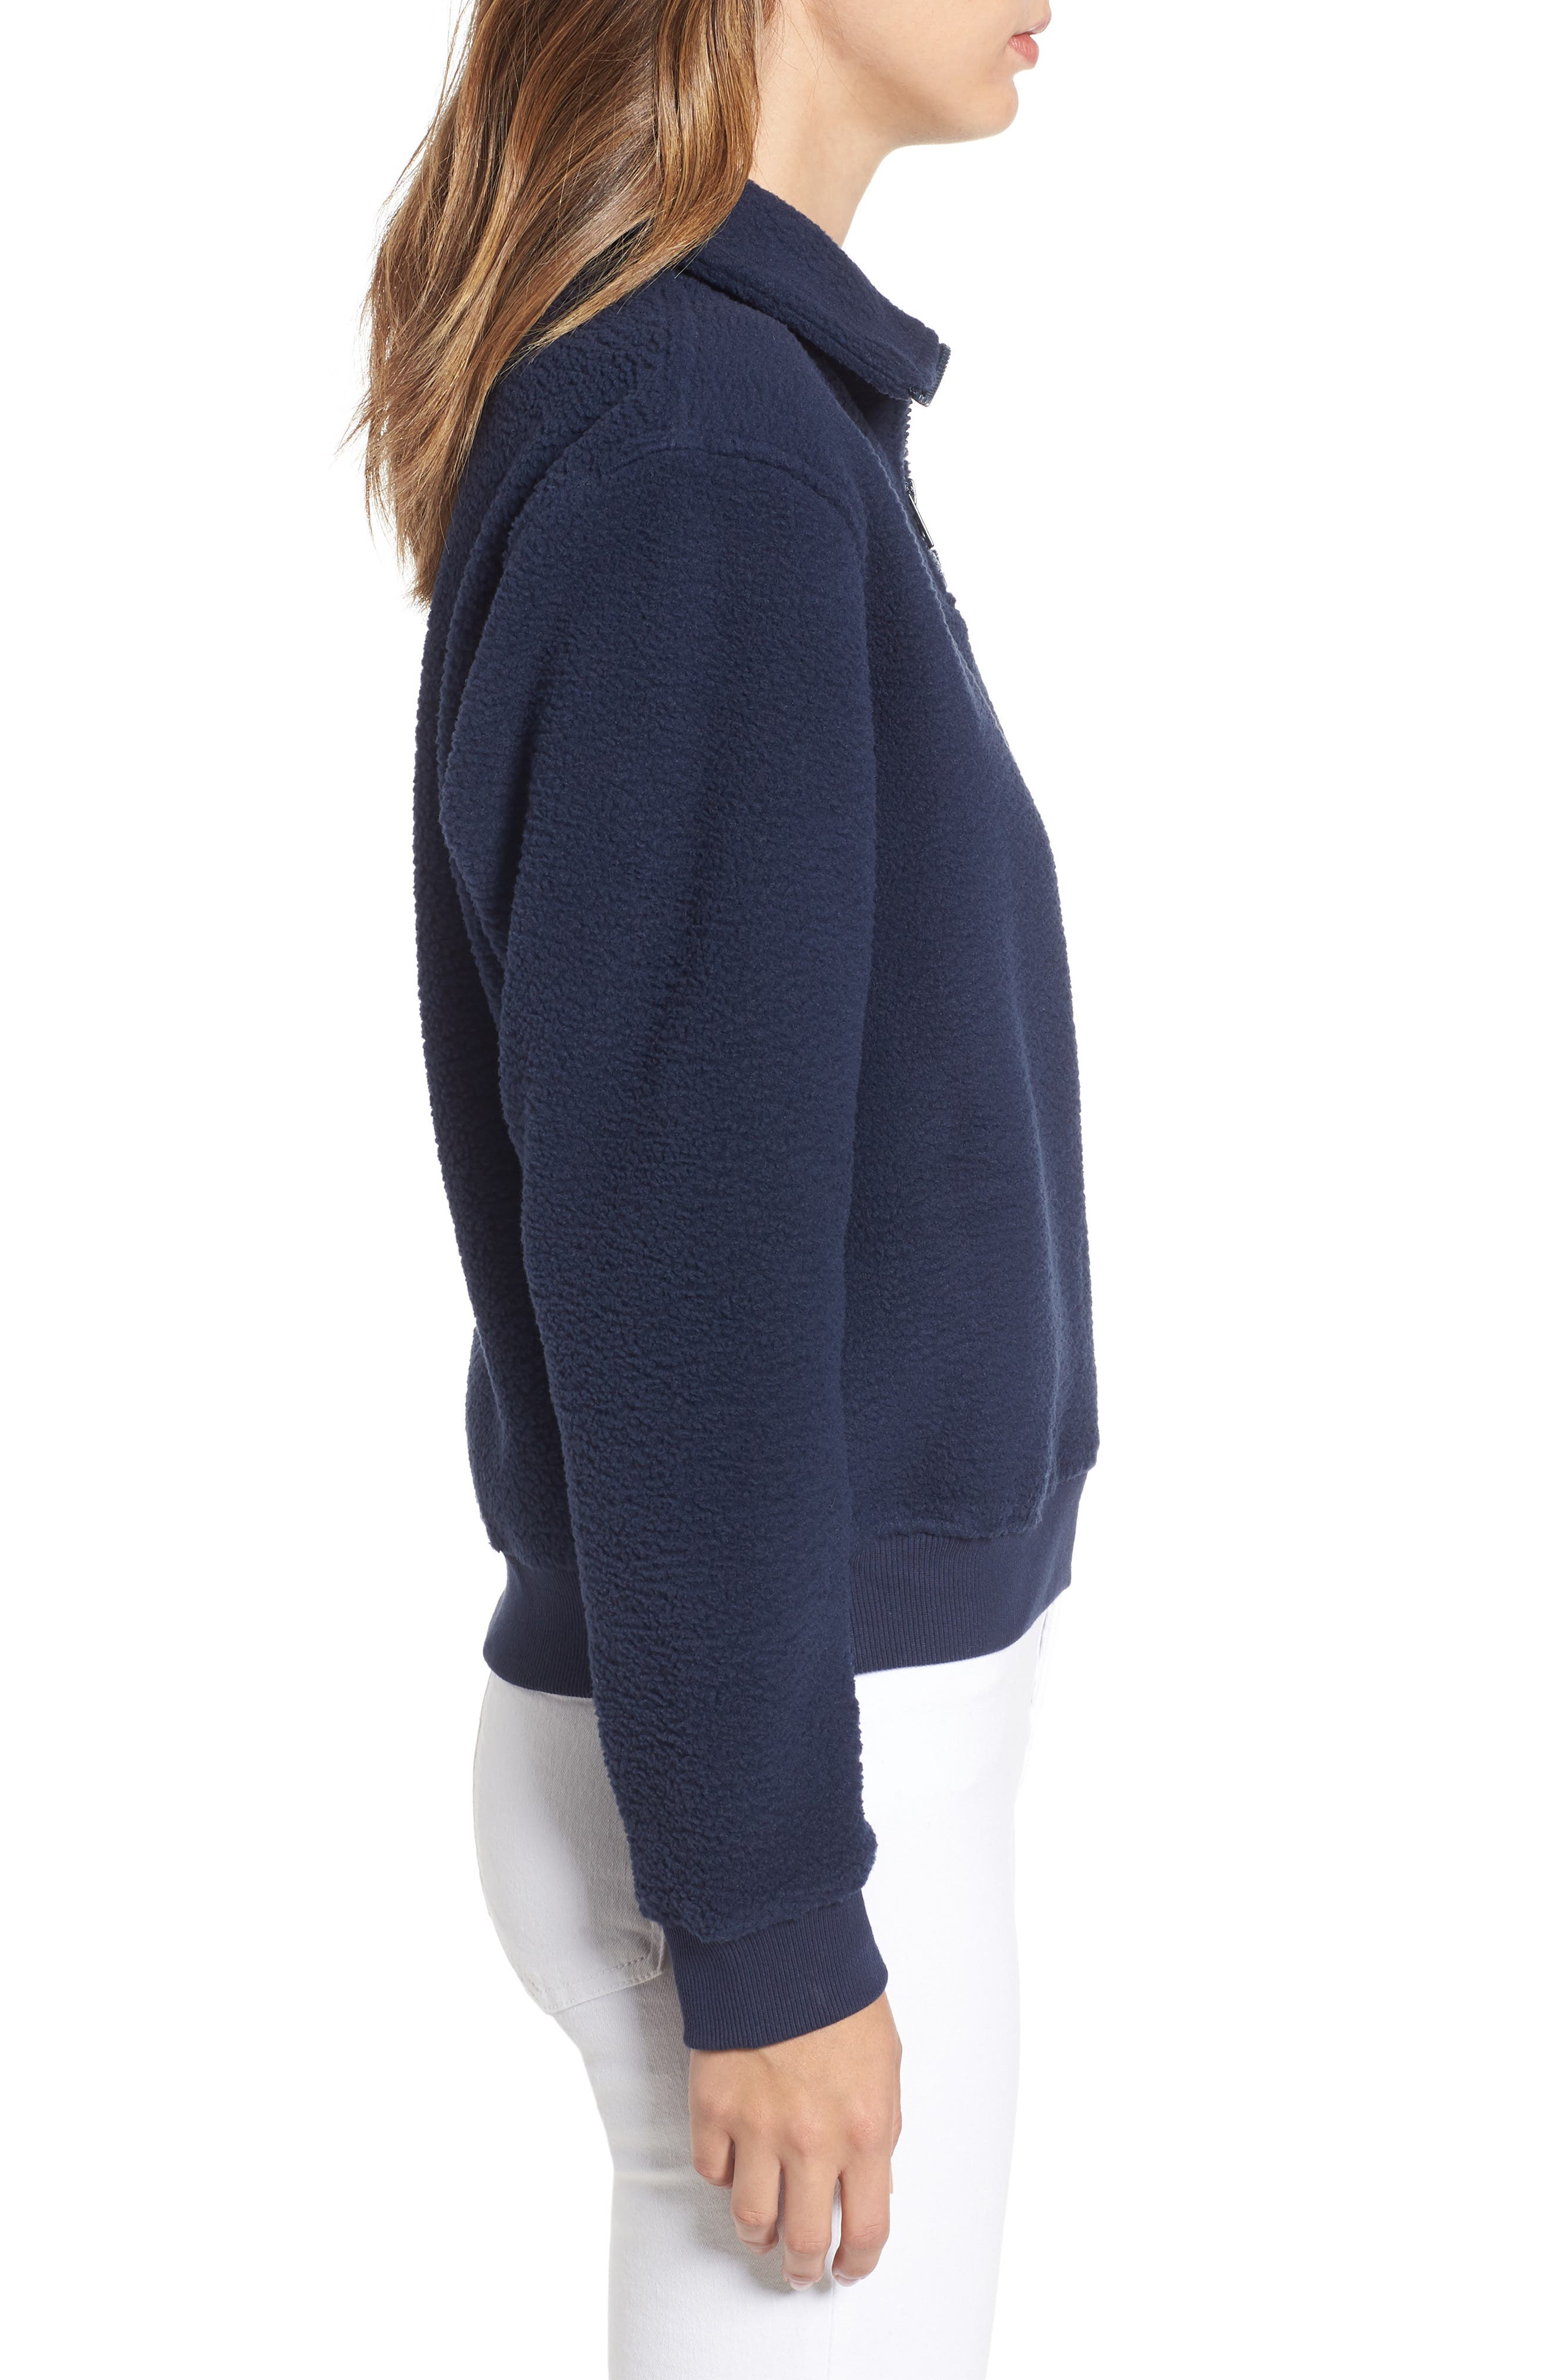 TJW Classics Polar Fleece Sweatshirt,                             Alternate thumbnail 3, color,                             002